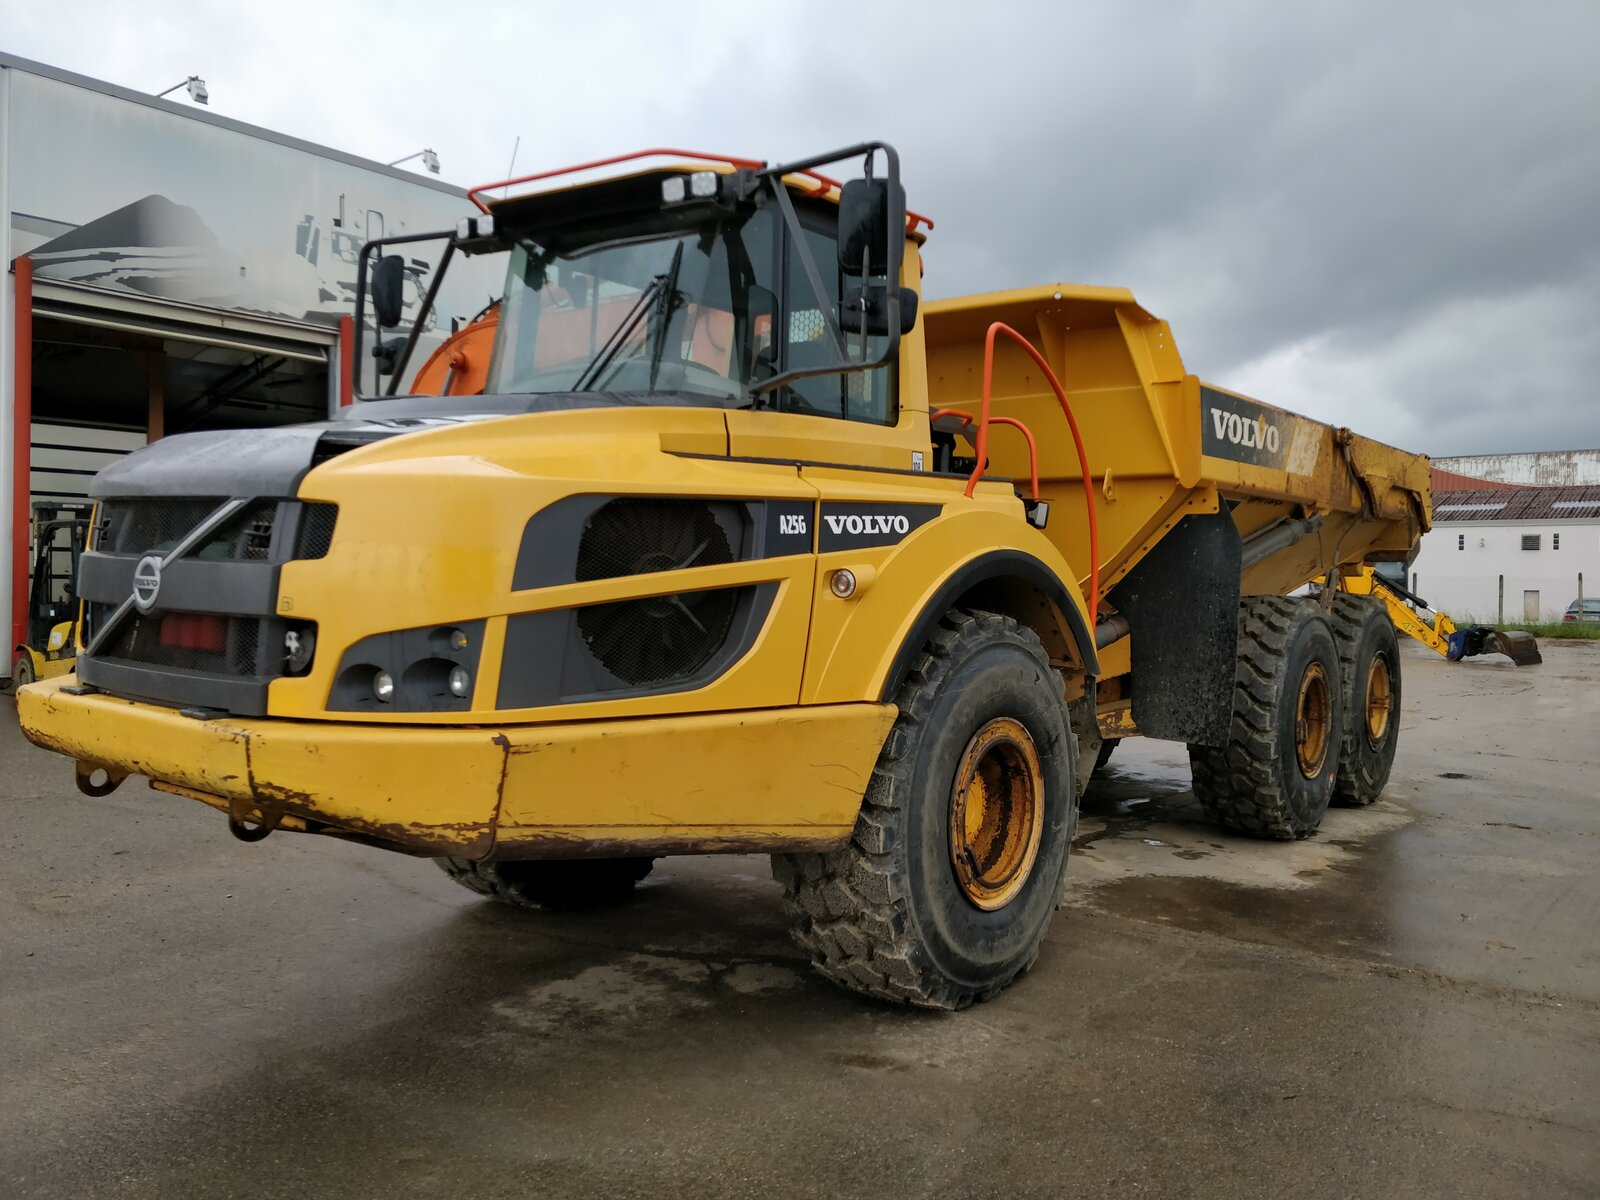 Articulated dump truck VOLVO A25G